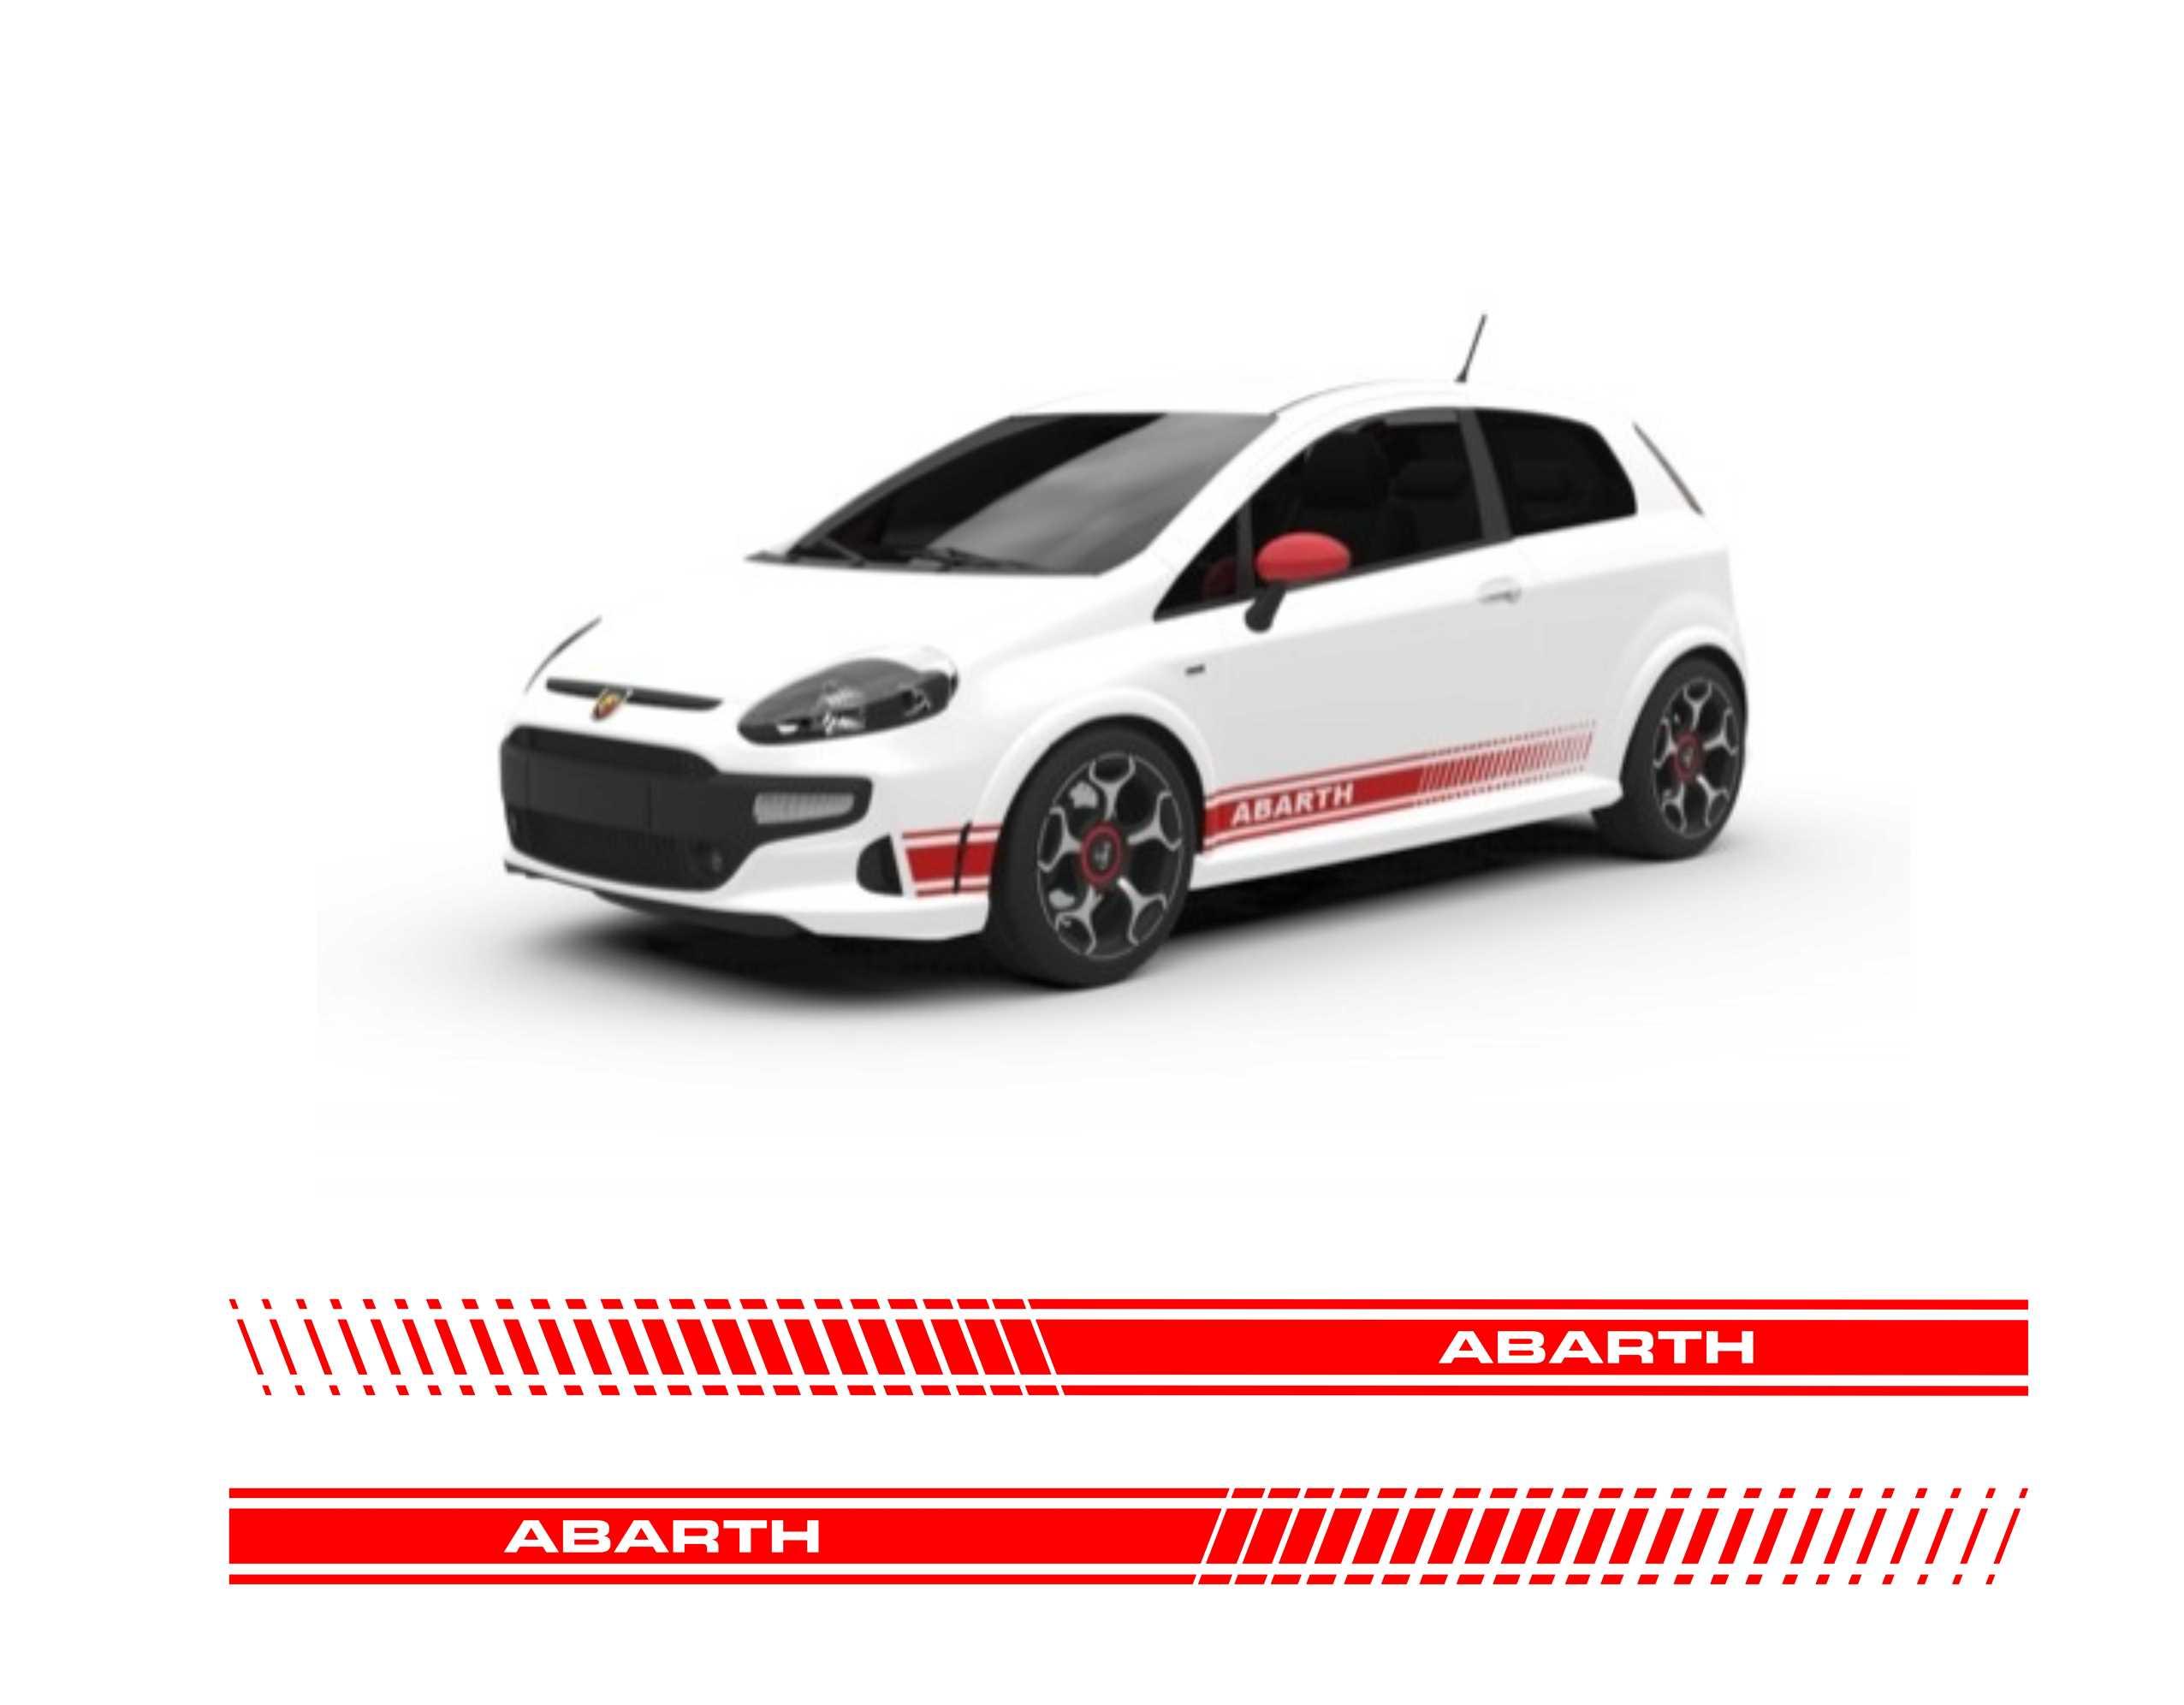 Fiat 500 Abarth Pasy Auto Grafika Naklejki Tuning